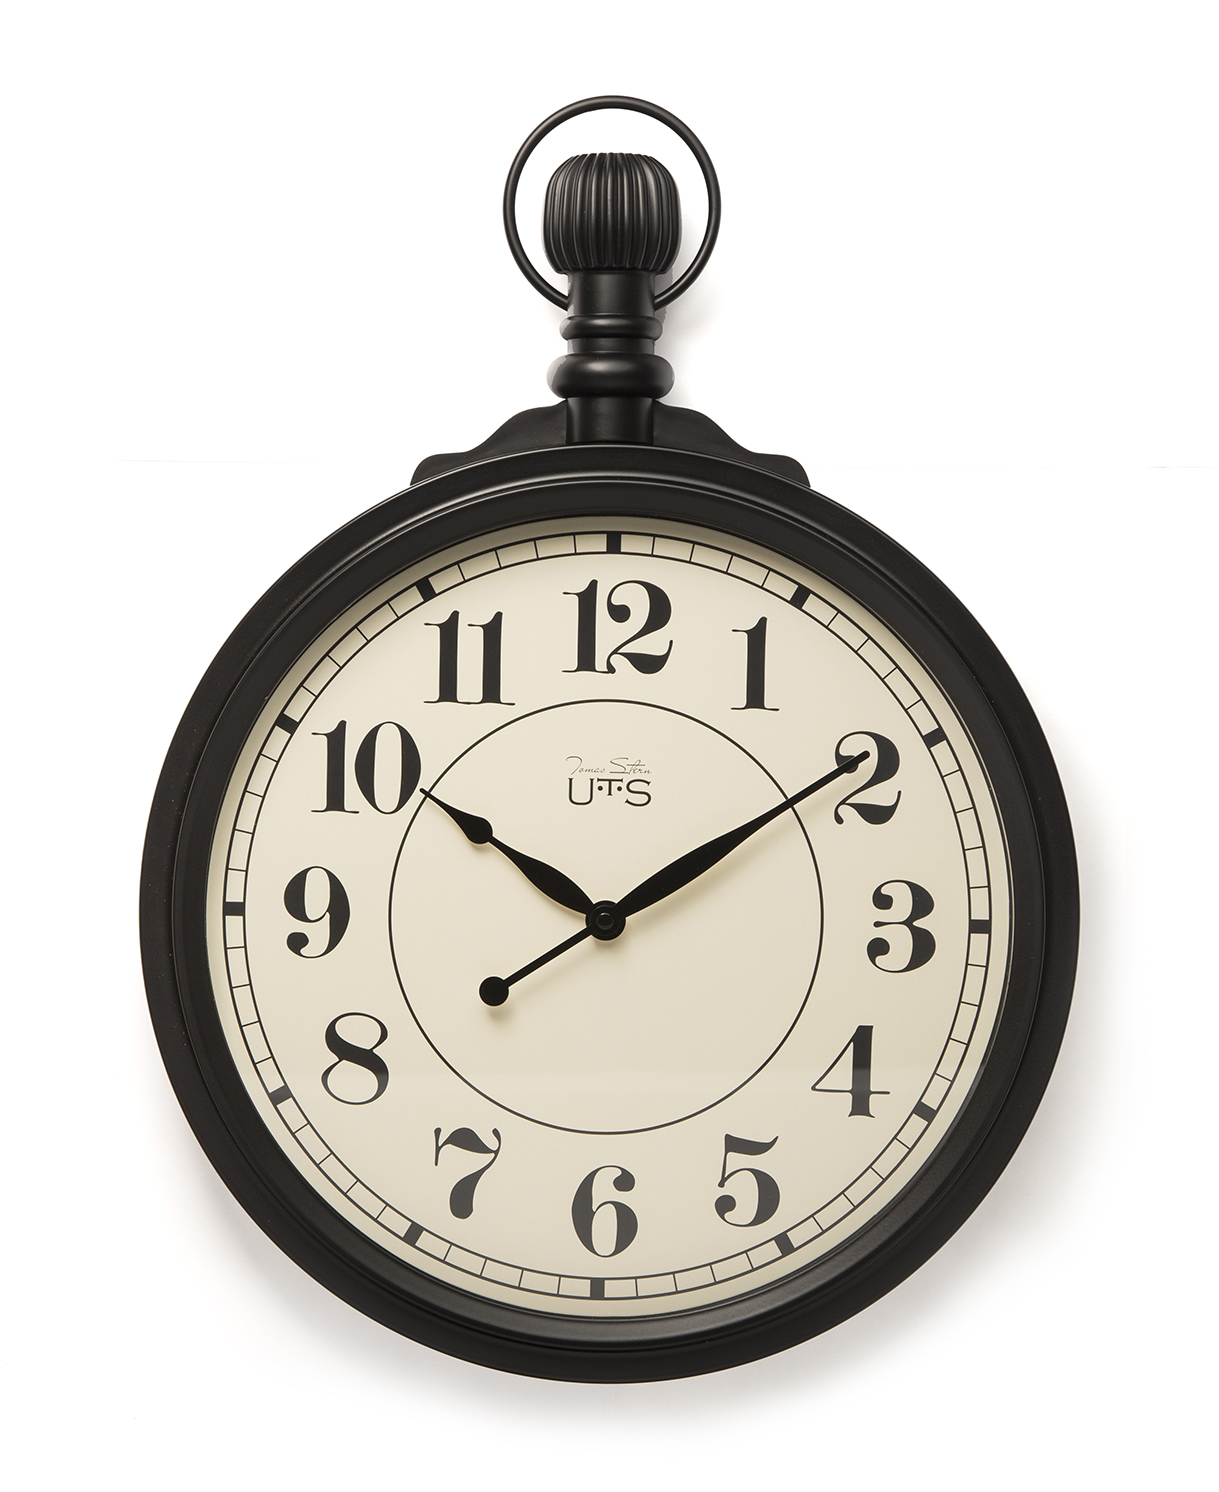 Часы настенные Часы настенные Tomas Stern 9013 chasy-nastennye-tomas-stern-9013-germaniya.jpg